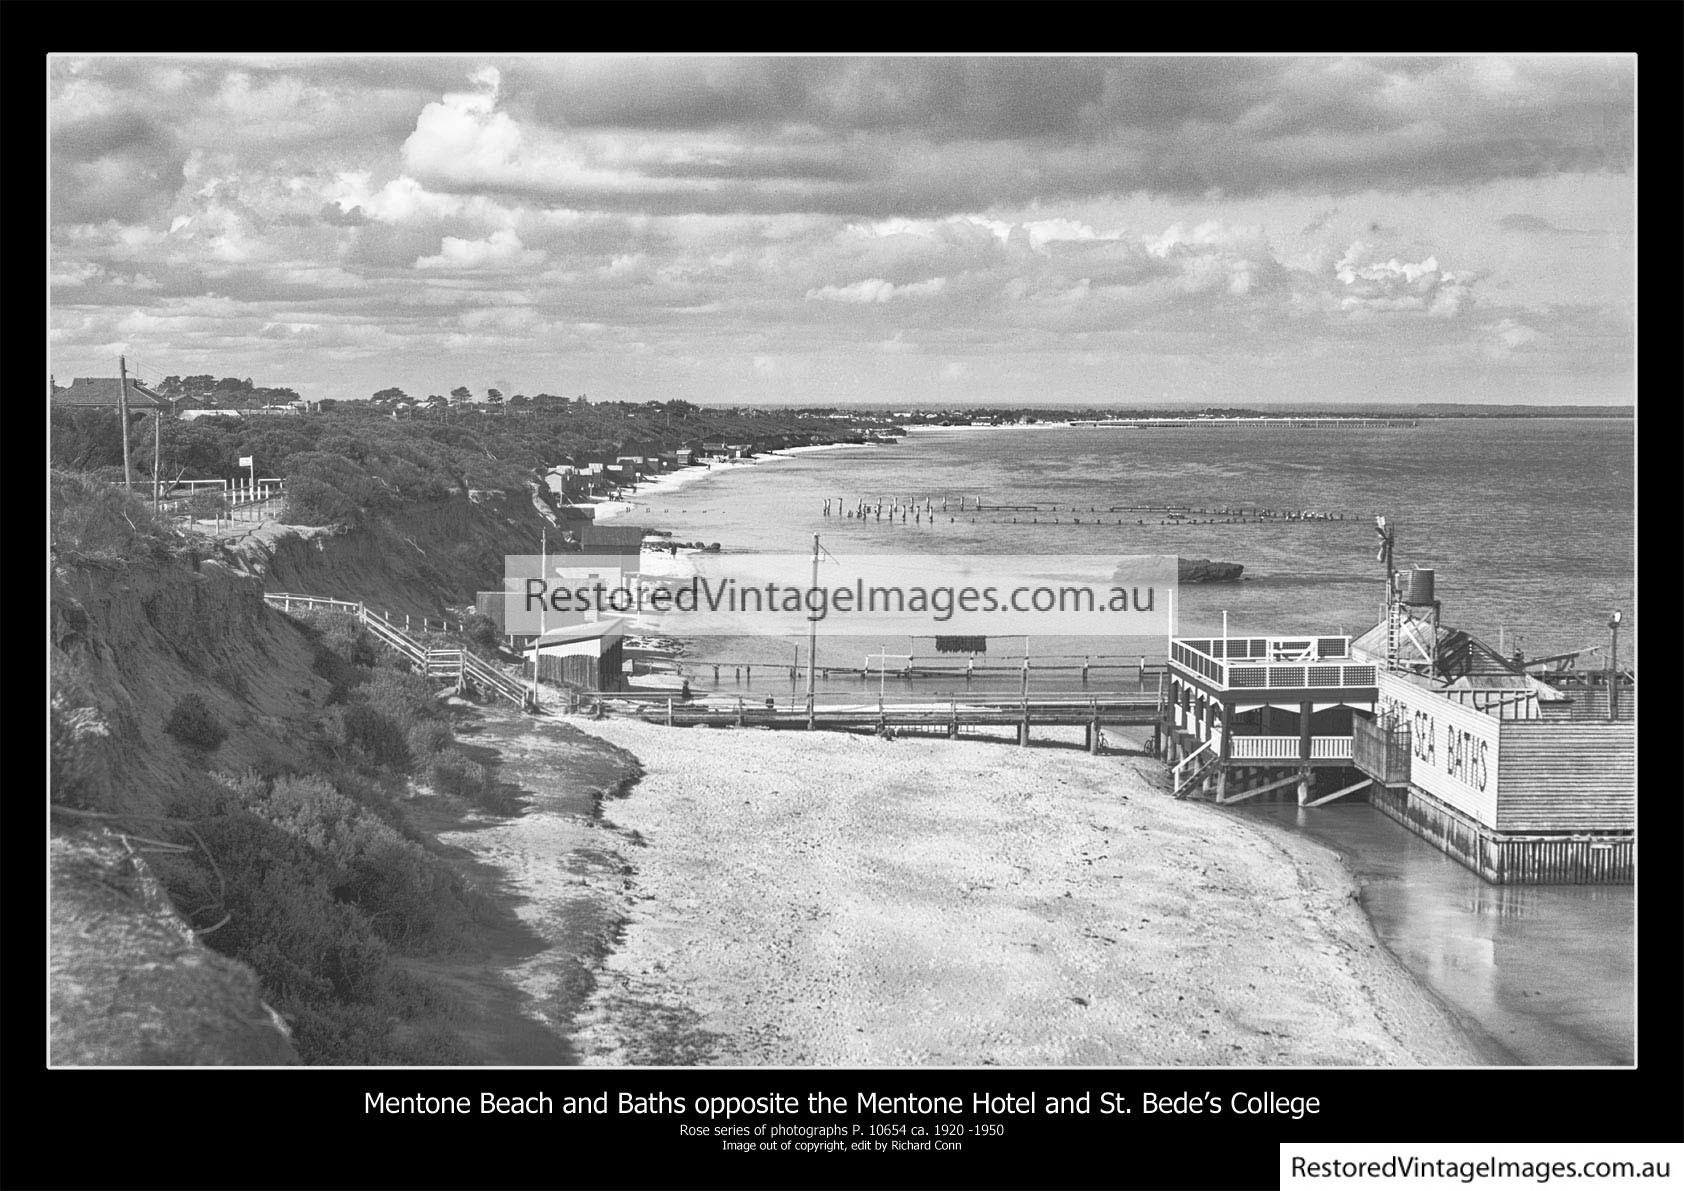 Mentone Beach And Baths By The Mentone Hotel